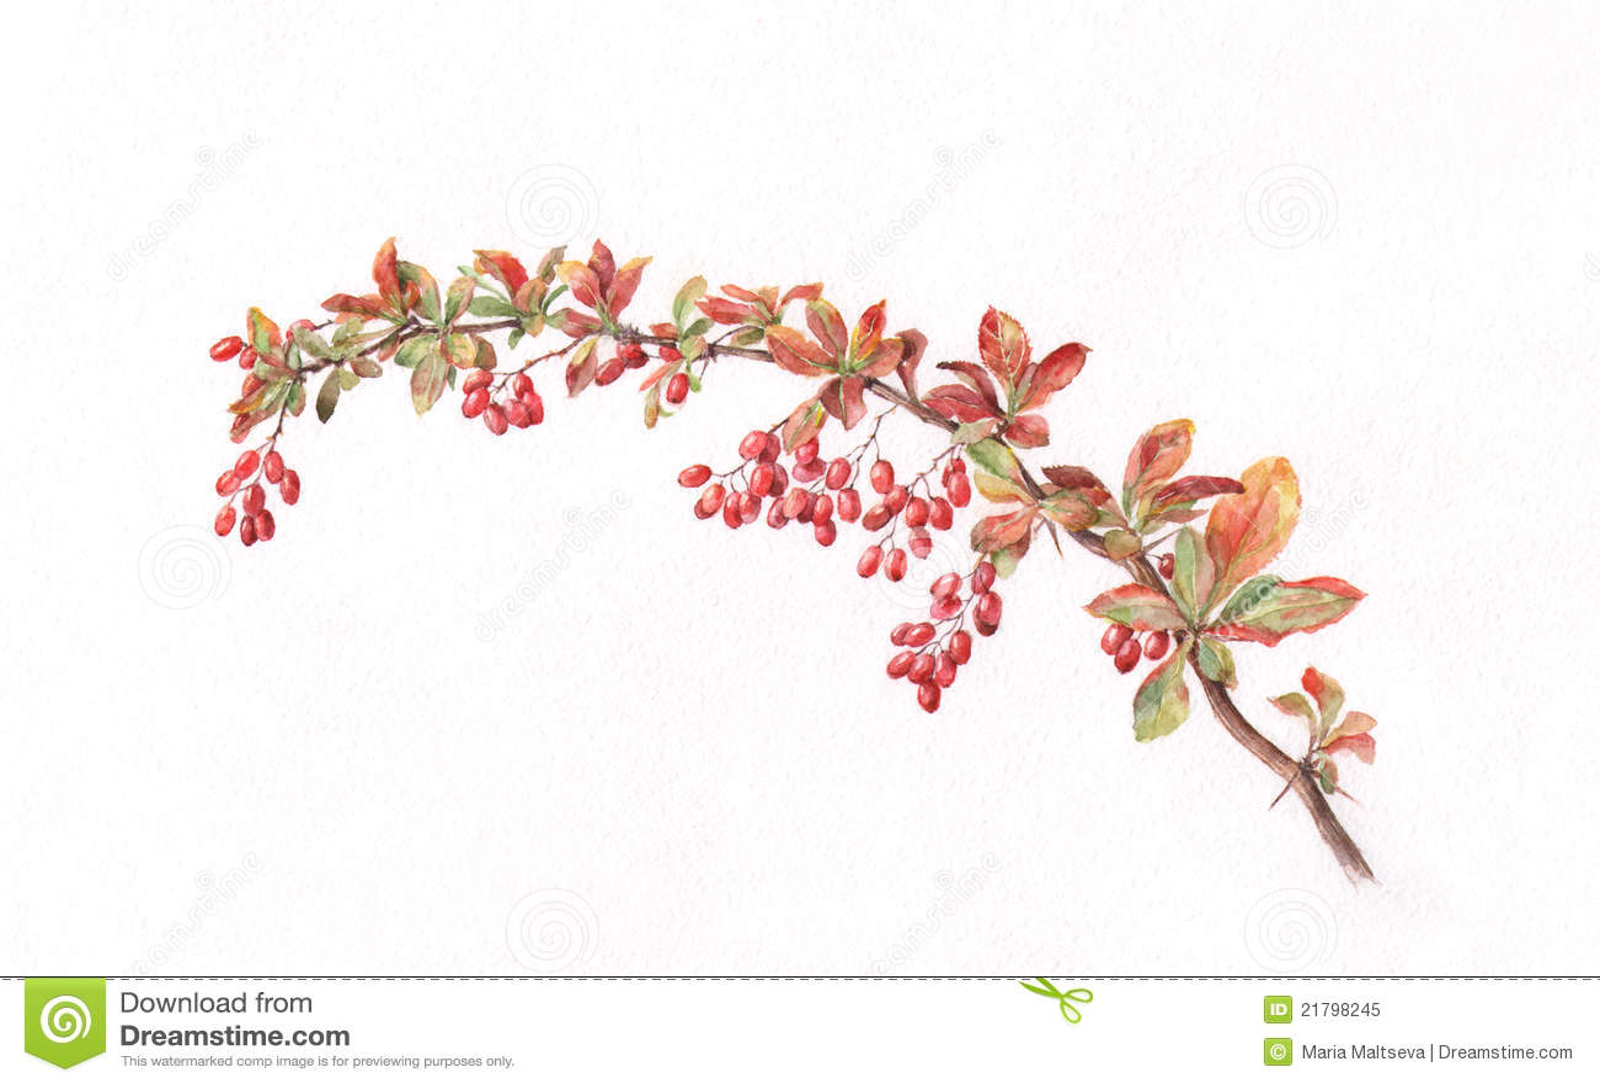 Berberis Branch Watercolor Painting Royalty Free Stock Photo - Image